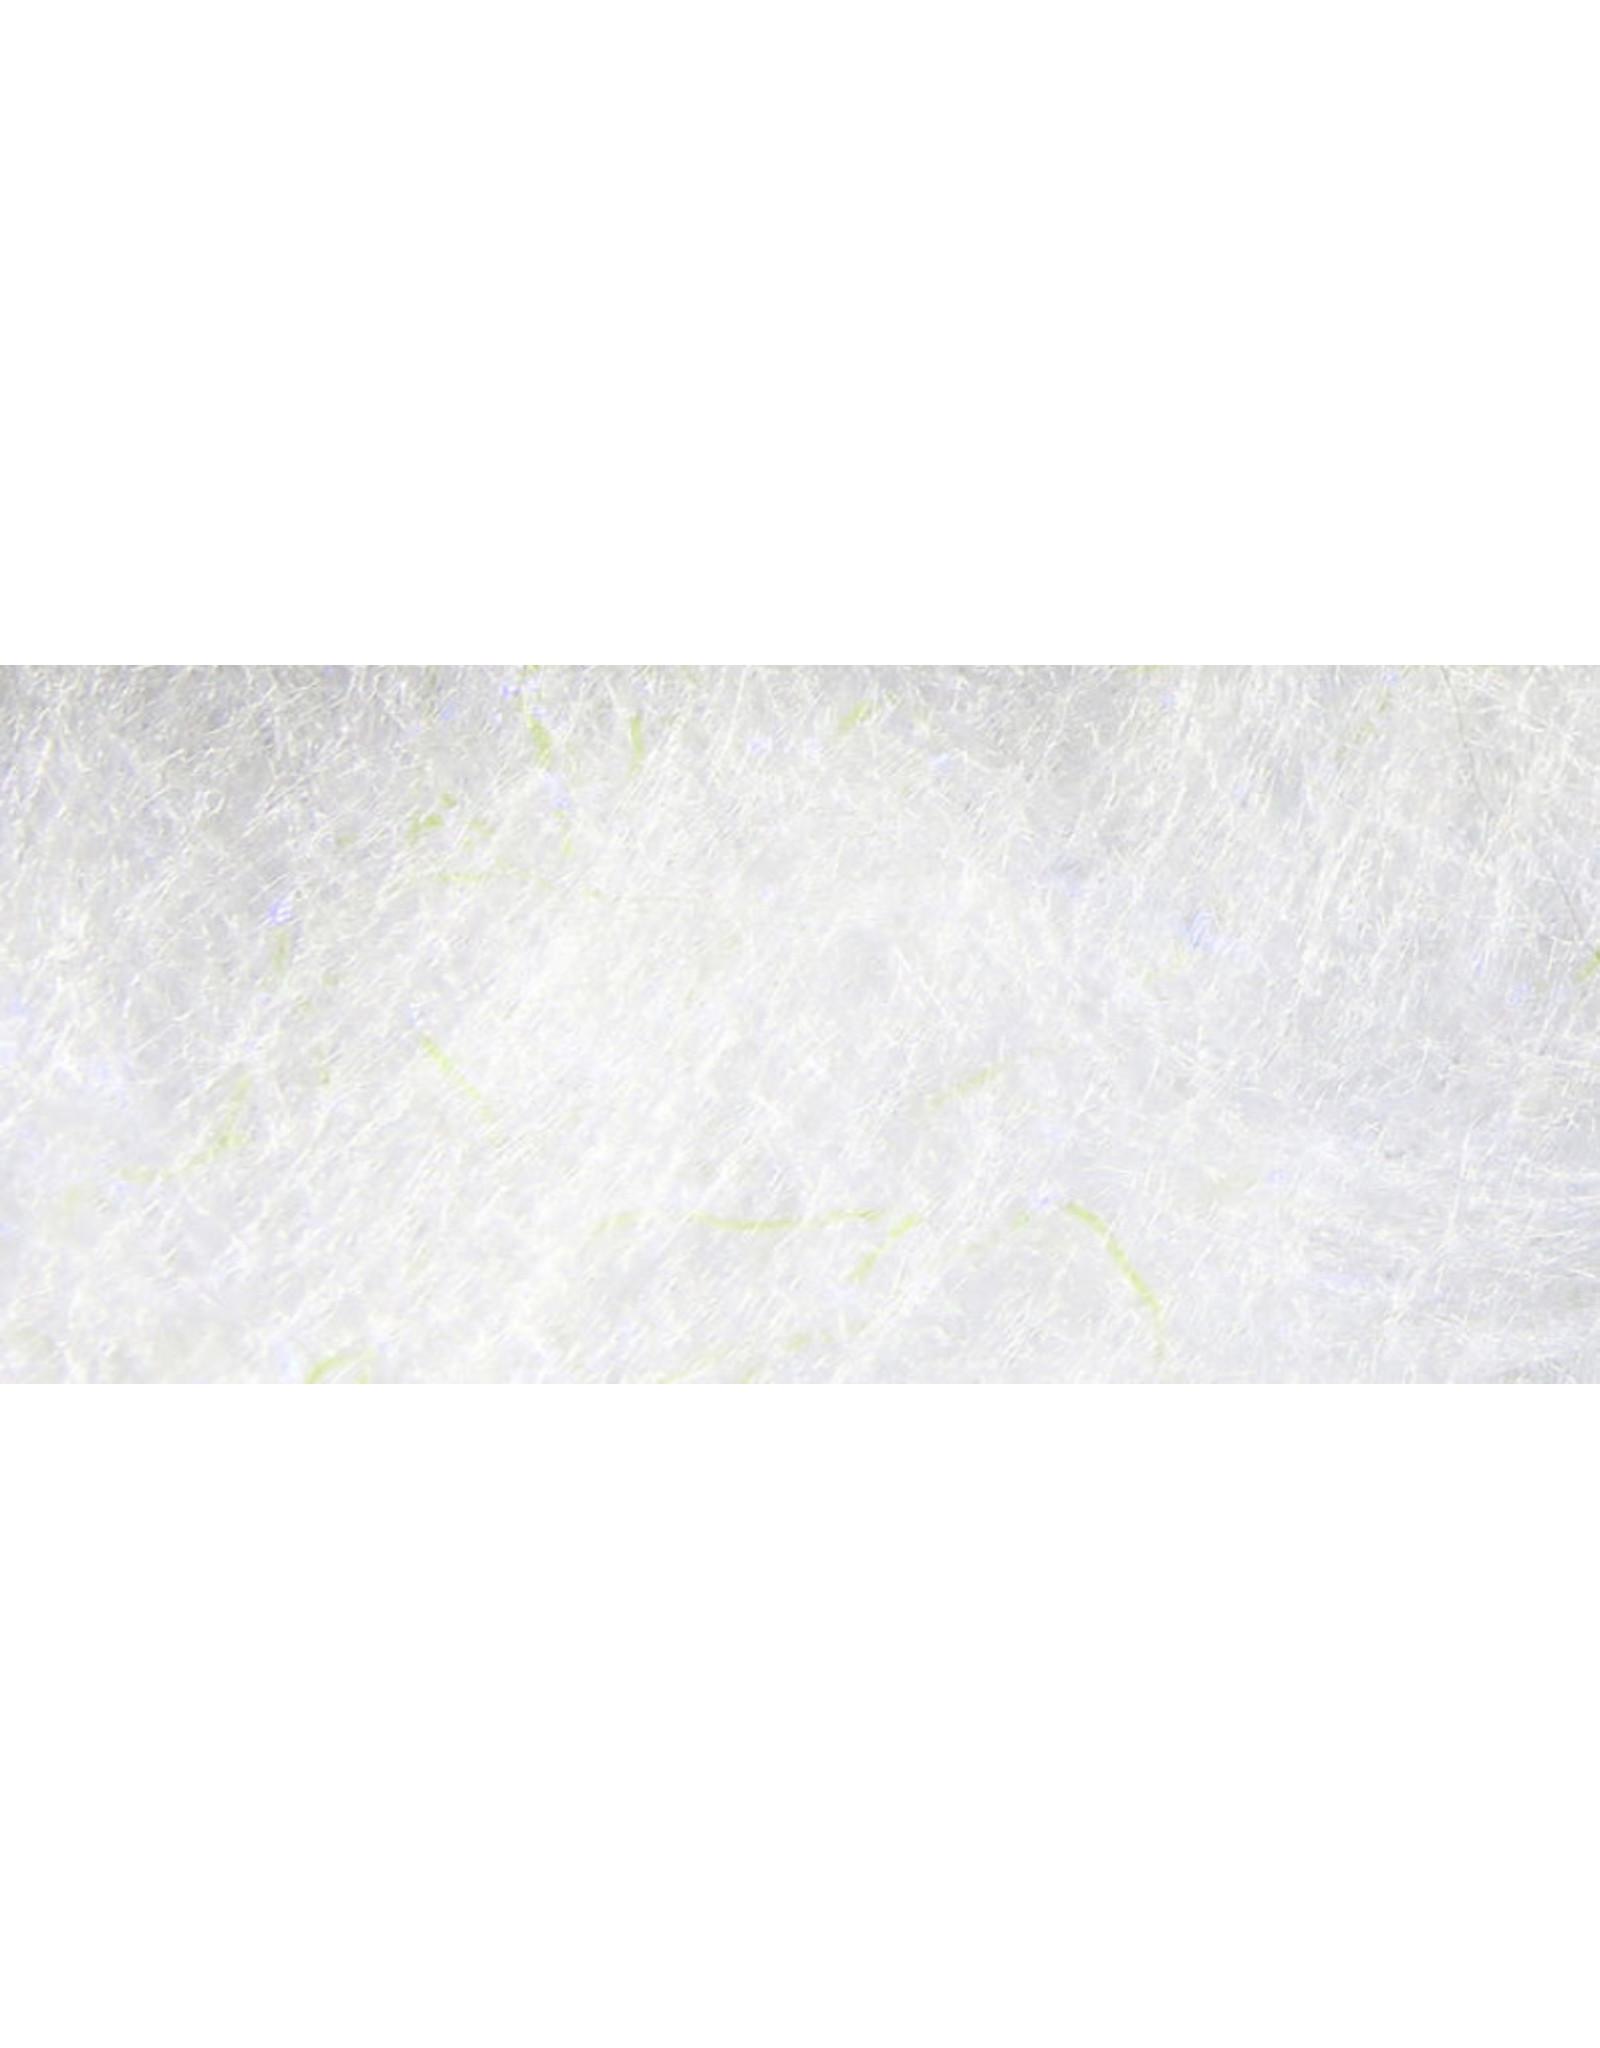 Hareline Fly Fish Food's Bruiser Blend #24 White